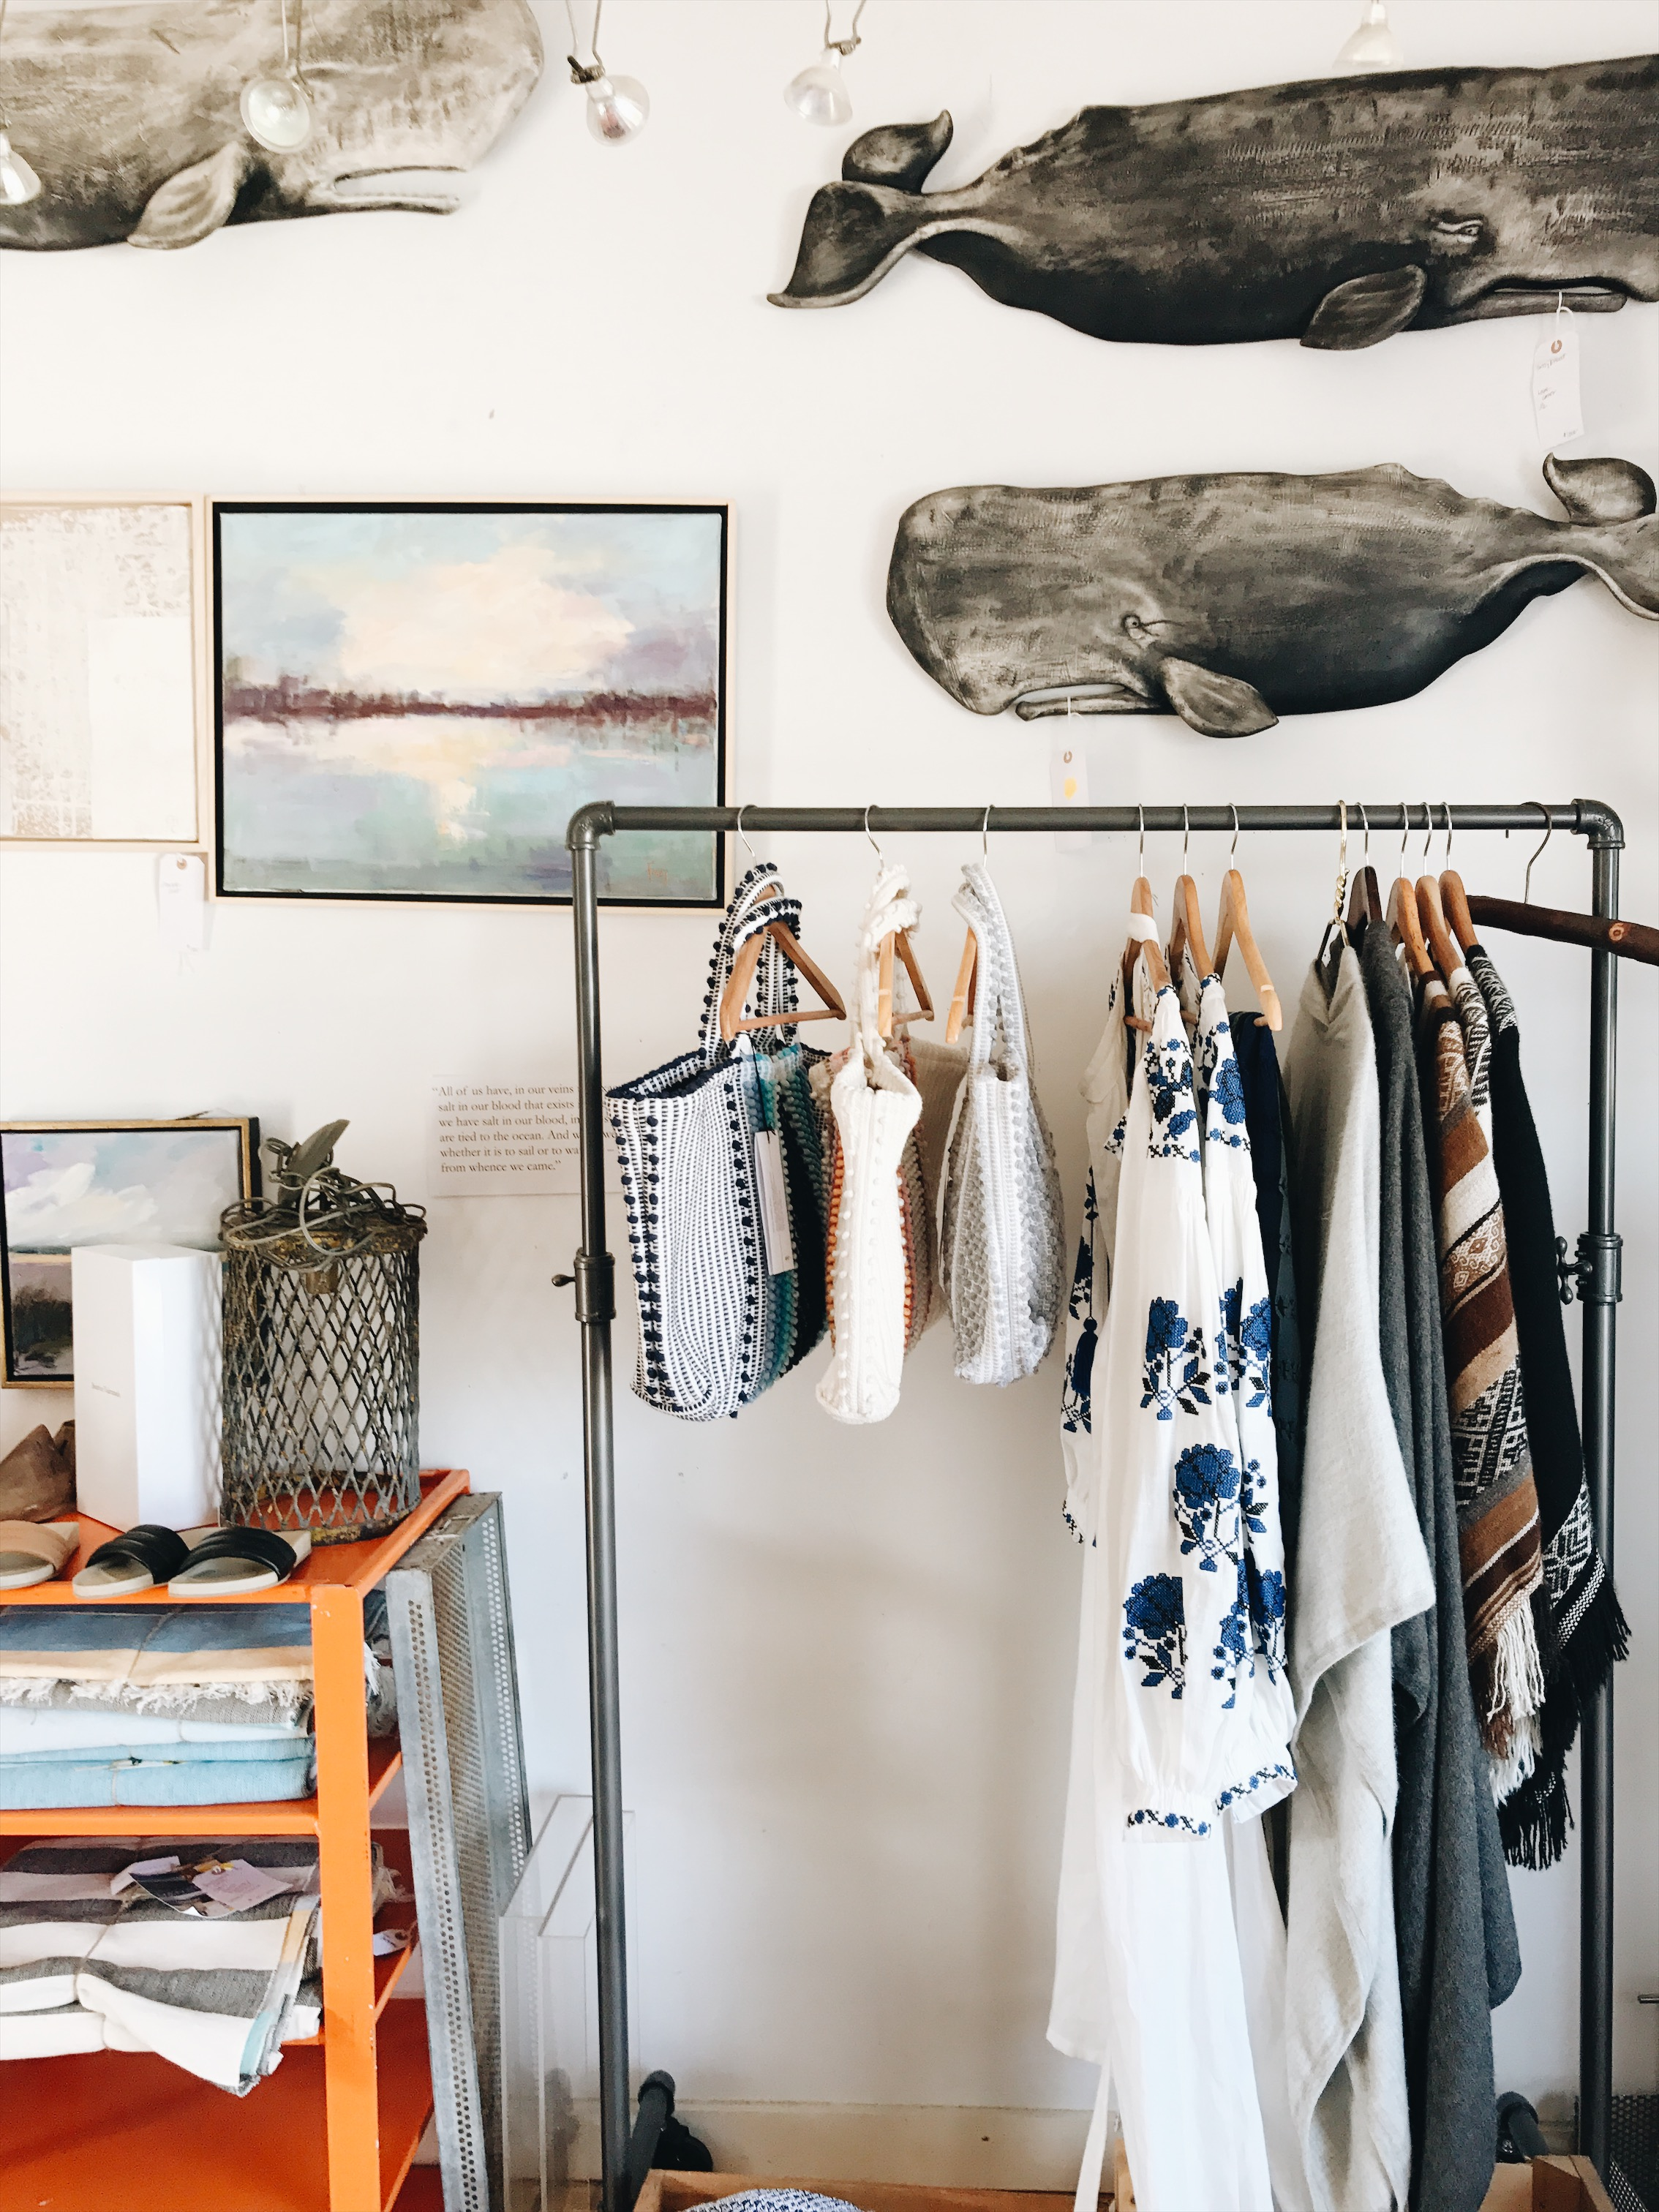 sustainable fashion, eco-friendly fashion, slow fashion, ethical fashion